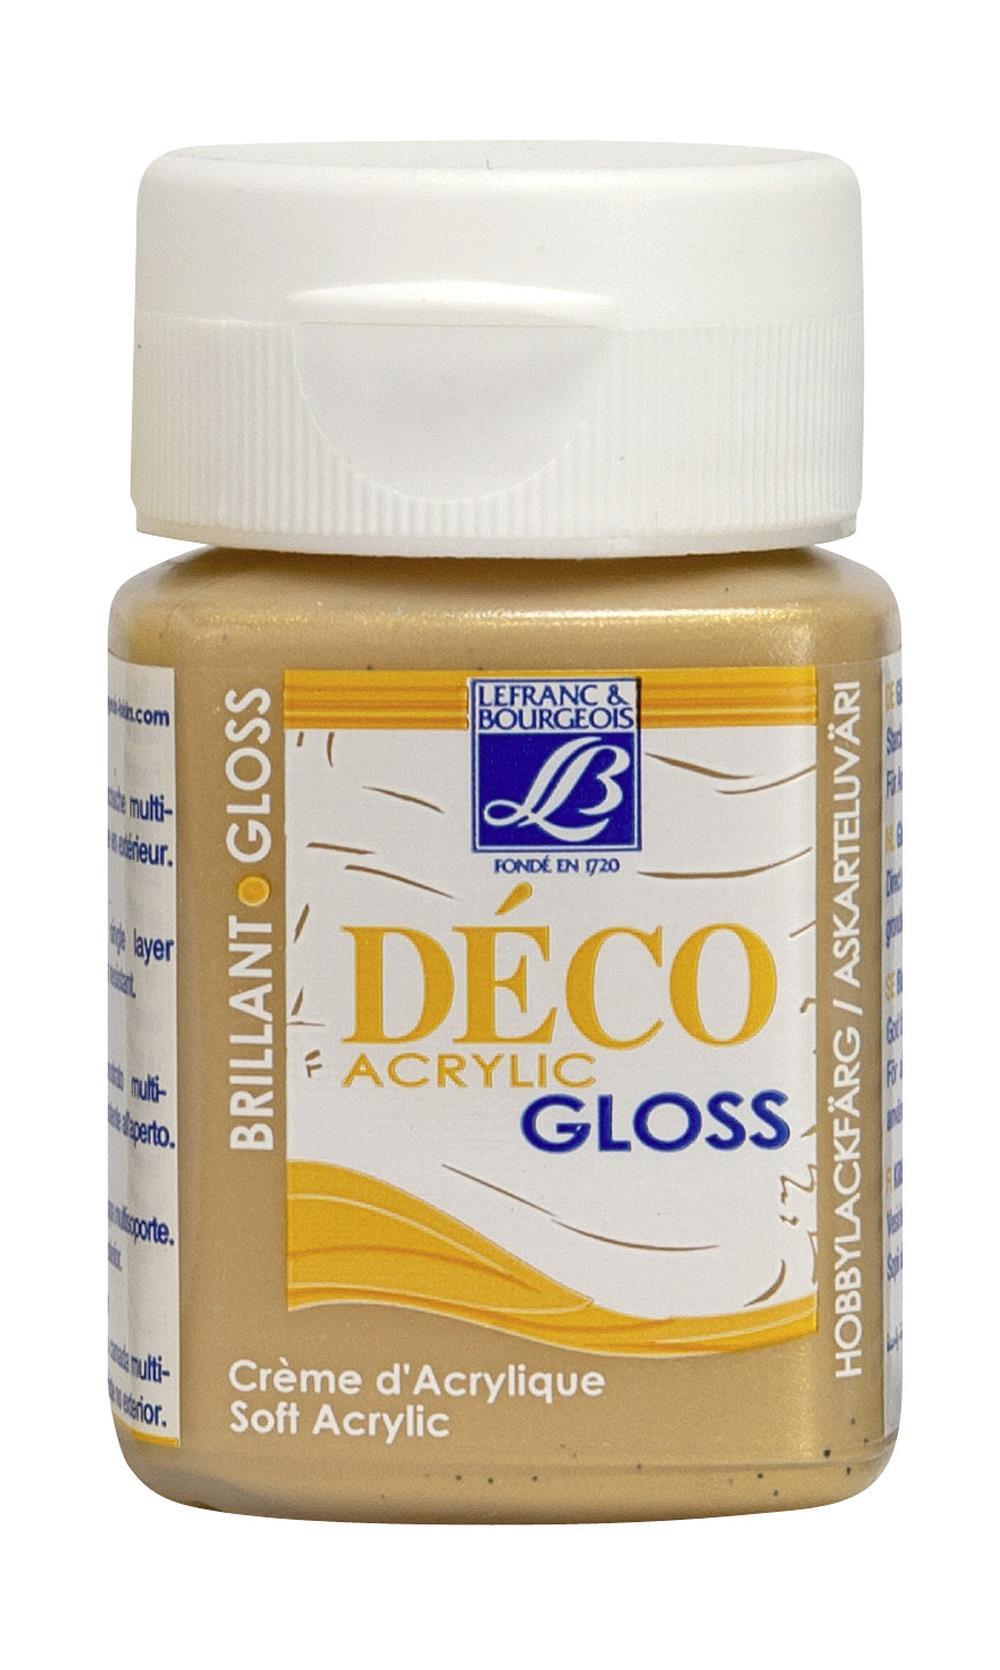 Hobbyfärg L&B Deco Gloss Akryl 50ml Gold 700 (4F) Utgår